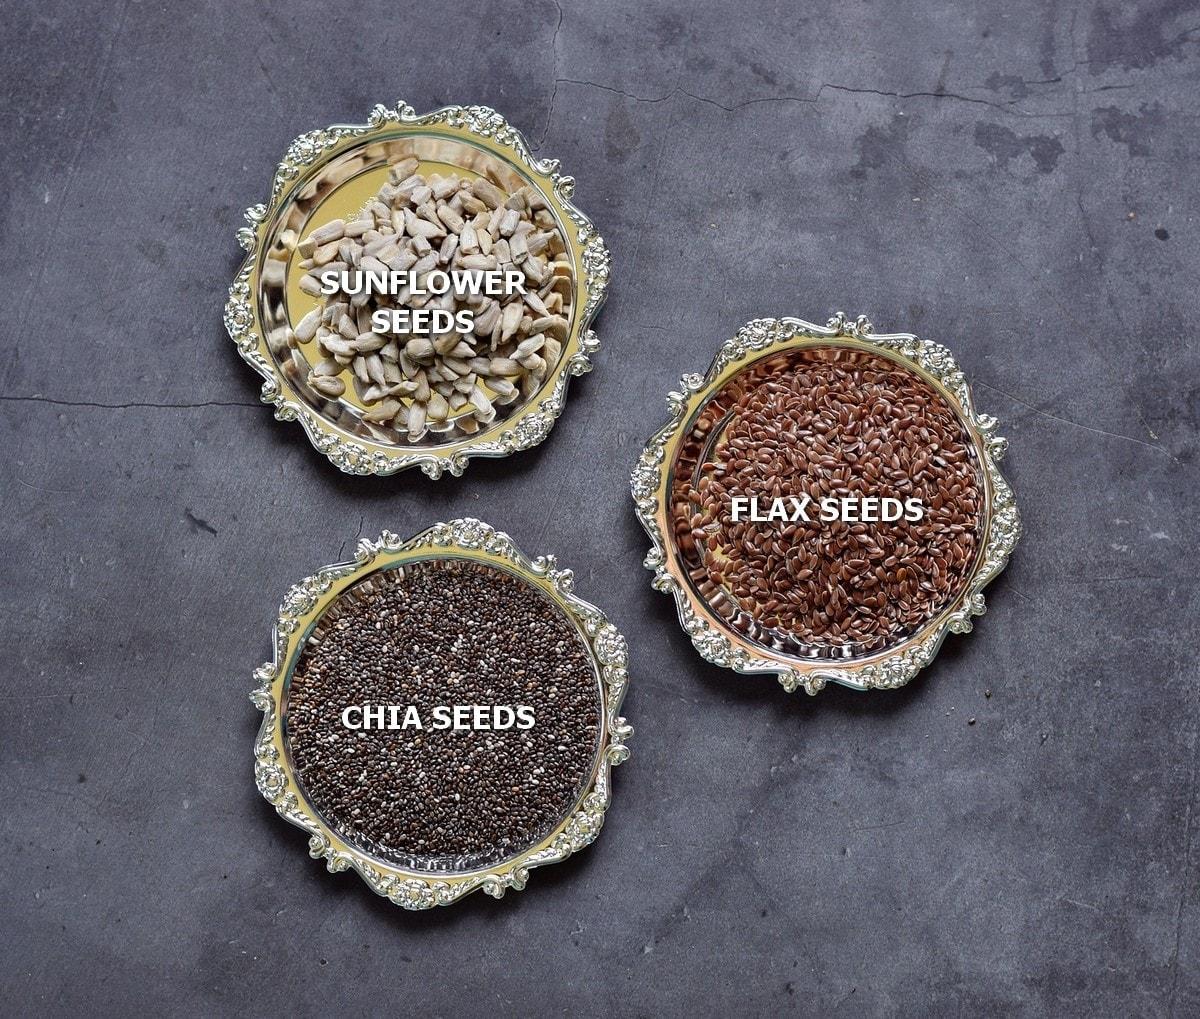 sunflower seeds, flax seeds, chia seeds